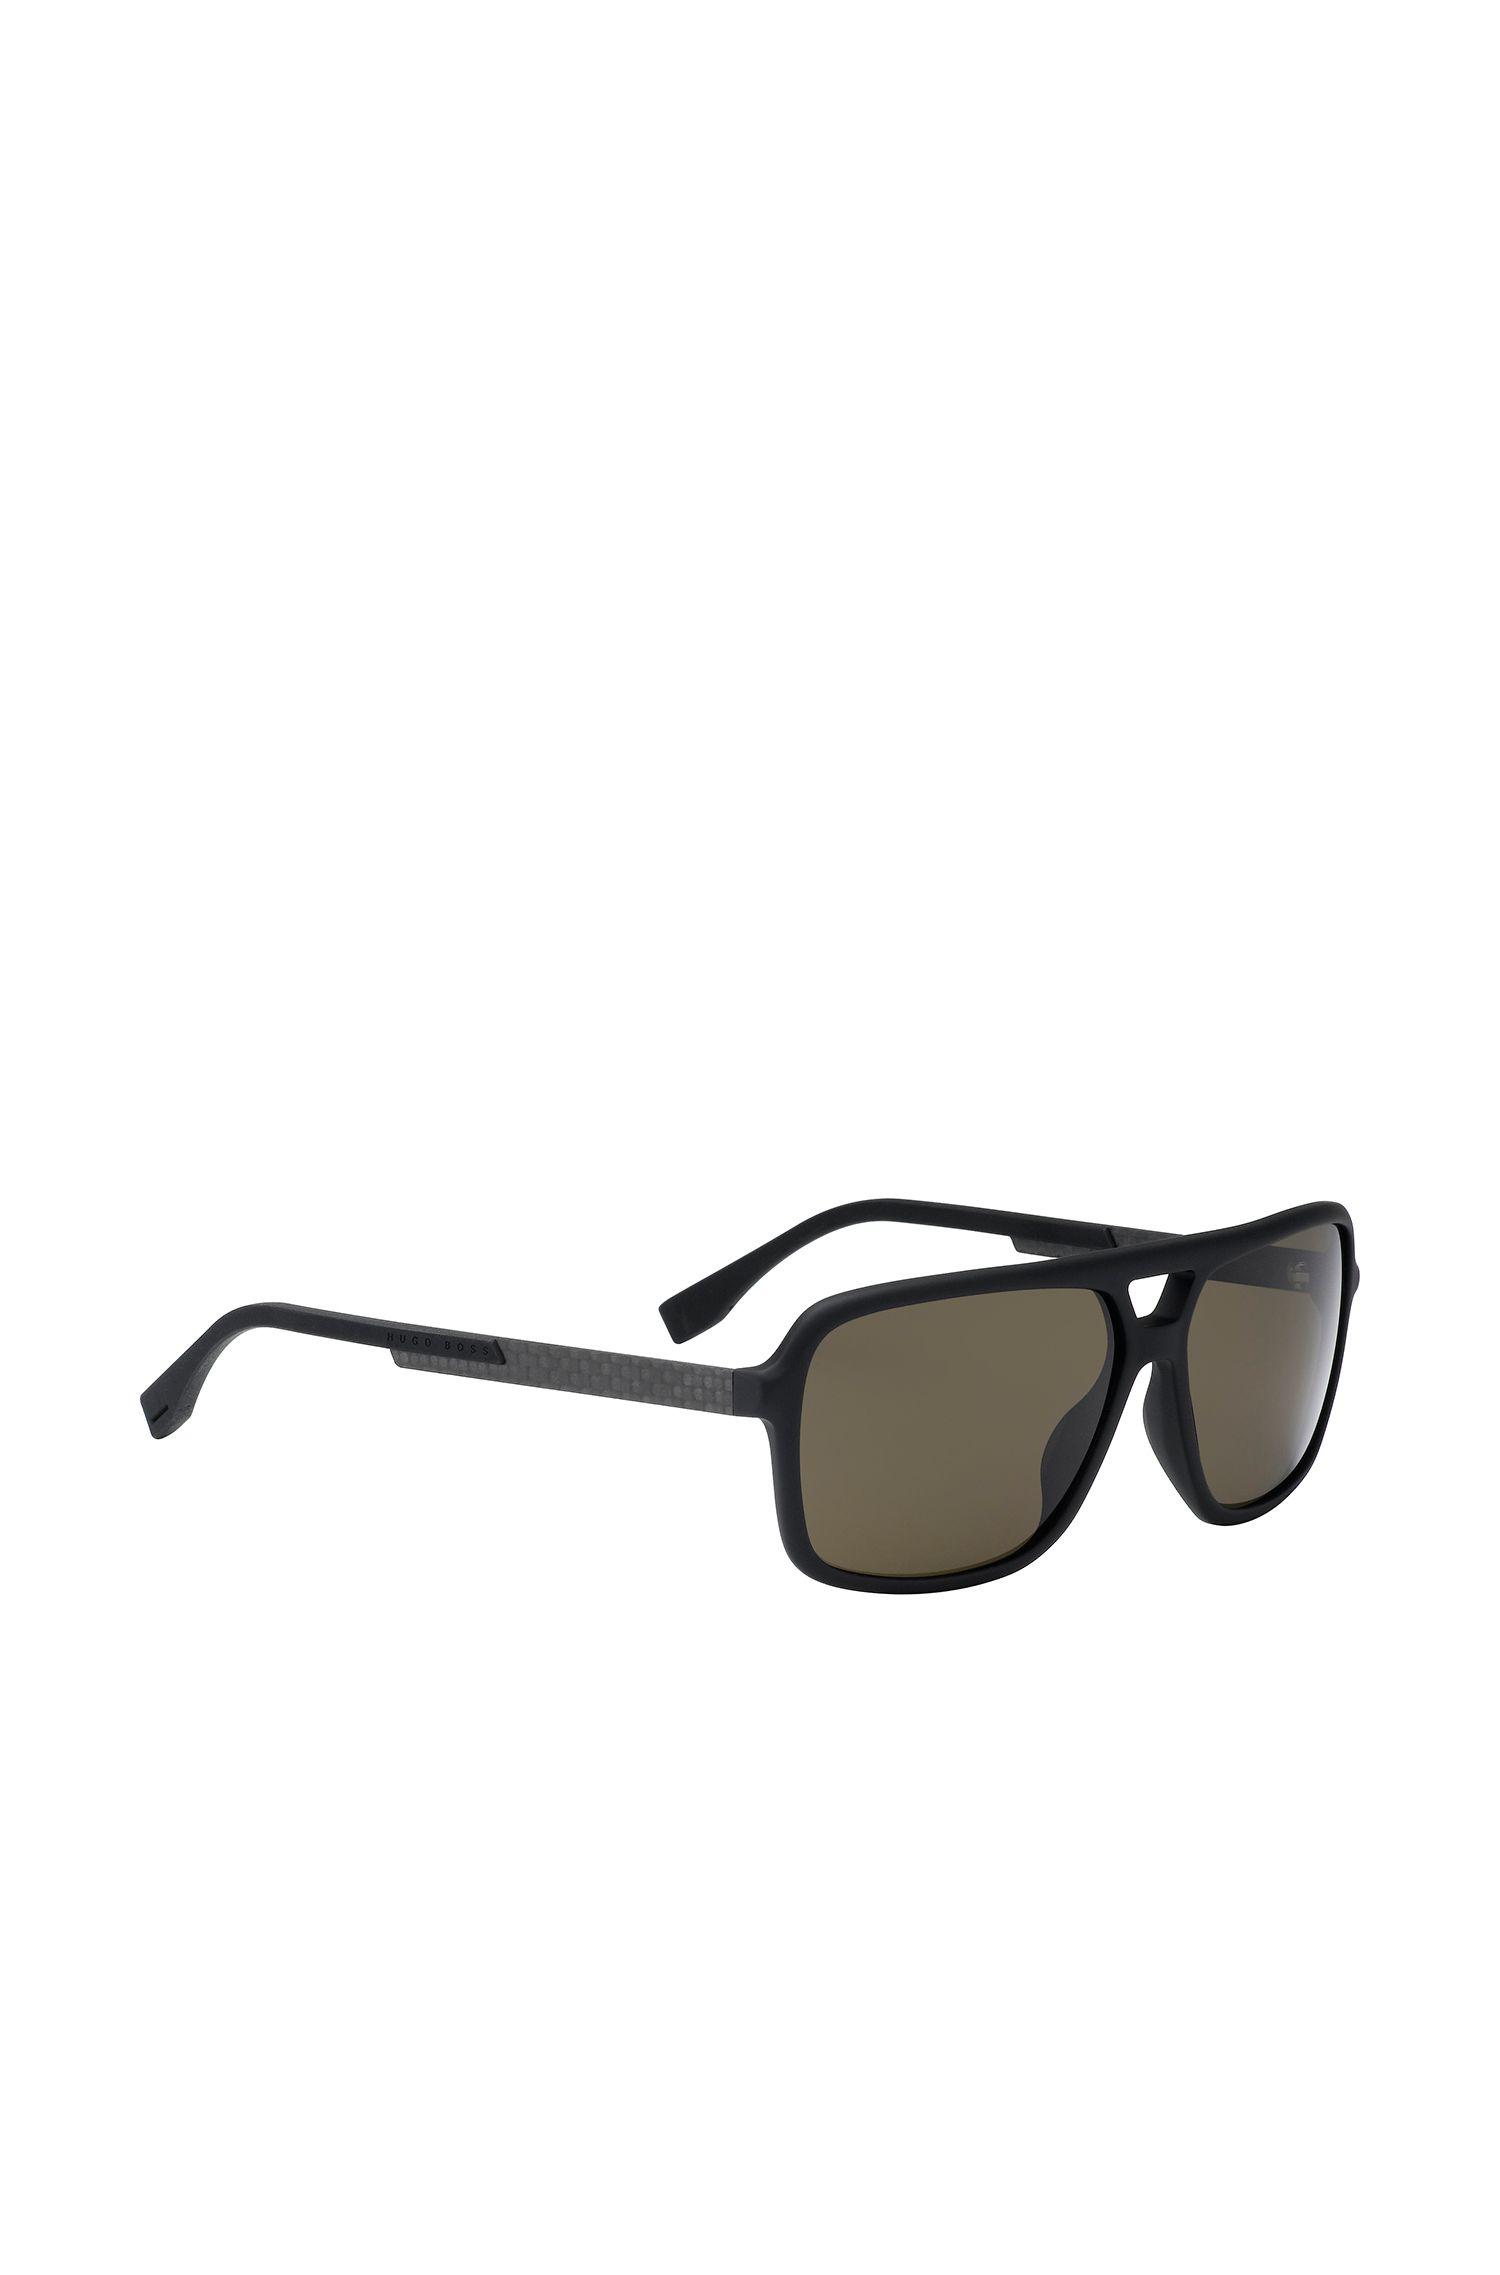 'BOSS 0772S'| Brown Grey Lens Navigator Sunglasses